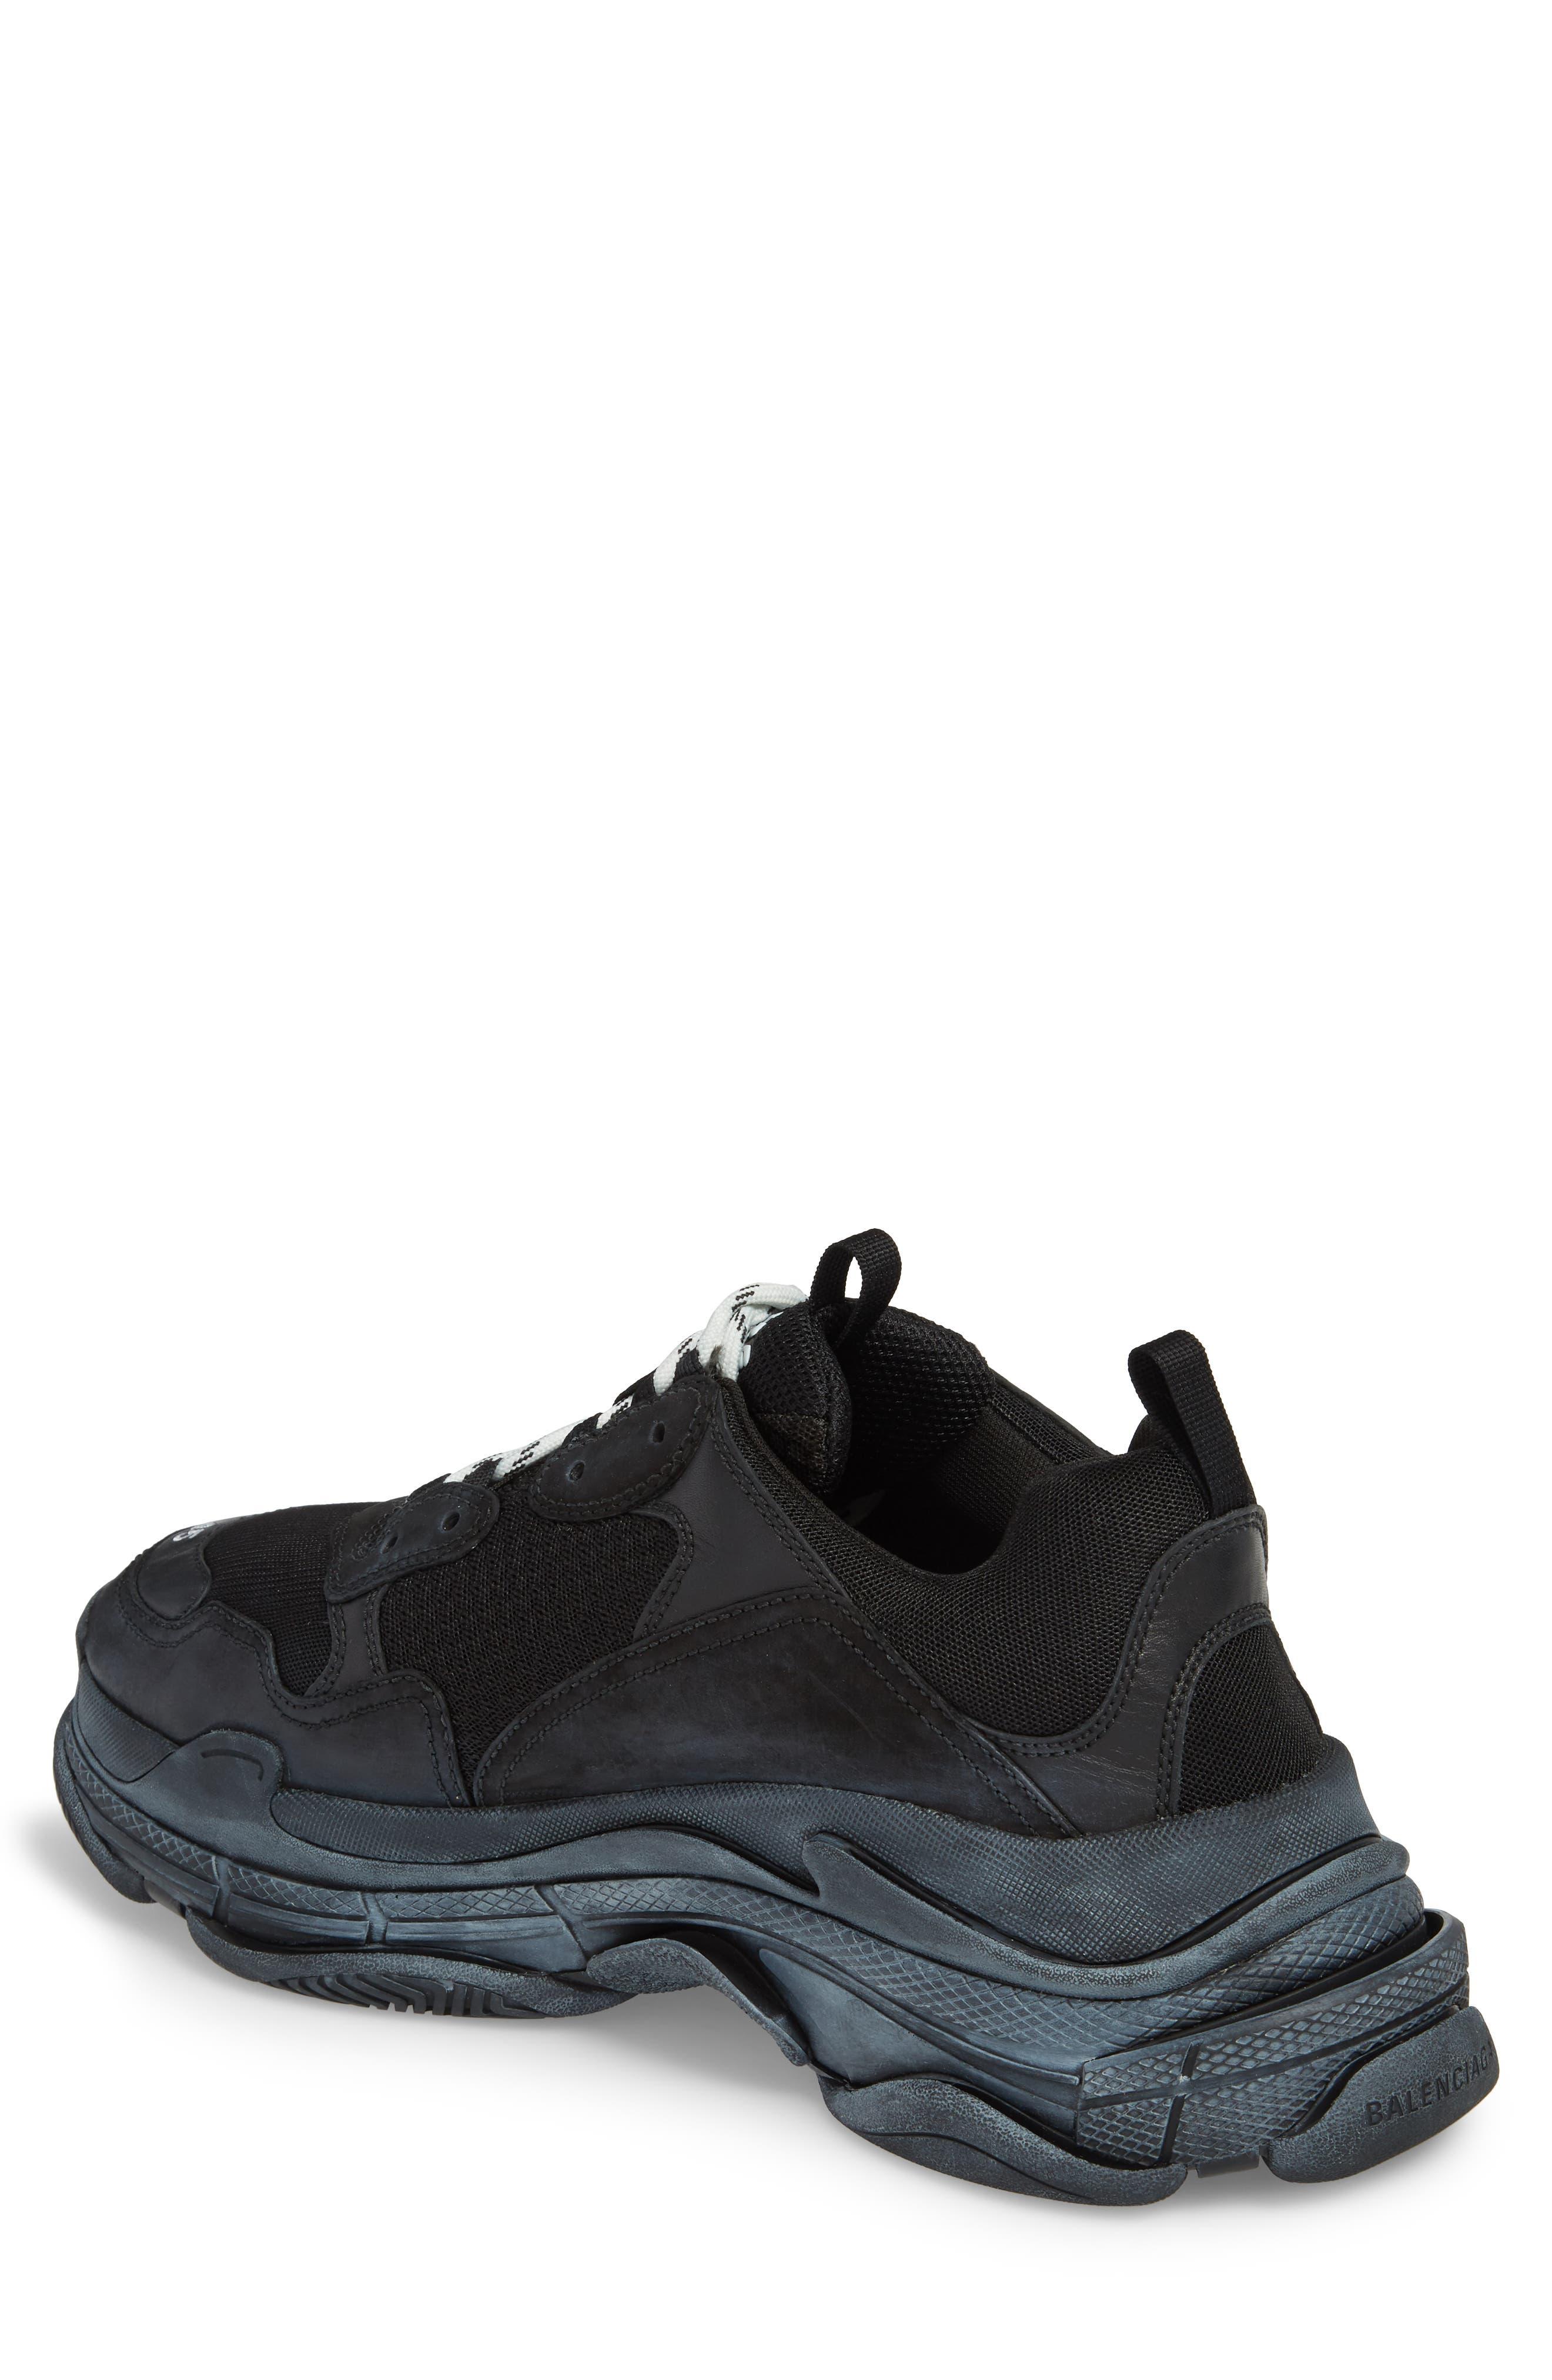 Triple S Retro Sneaker,                             Alternate thumbnail 2, color,                             NOIR